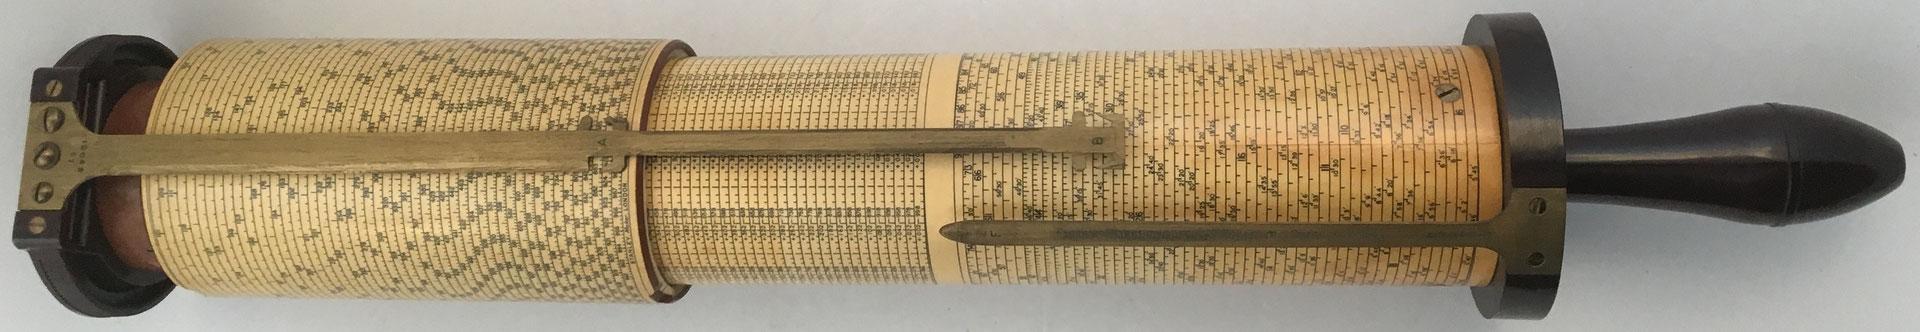 Regla cilíndrica FULLER, año 1957, s/n 12068, 9 cm diámetro